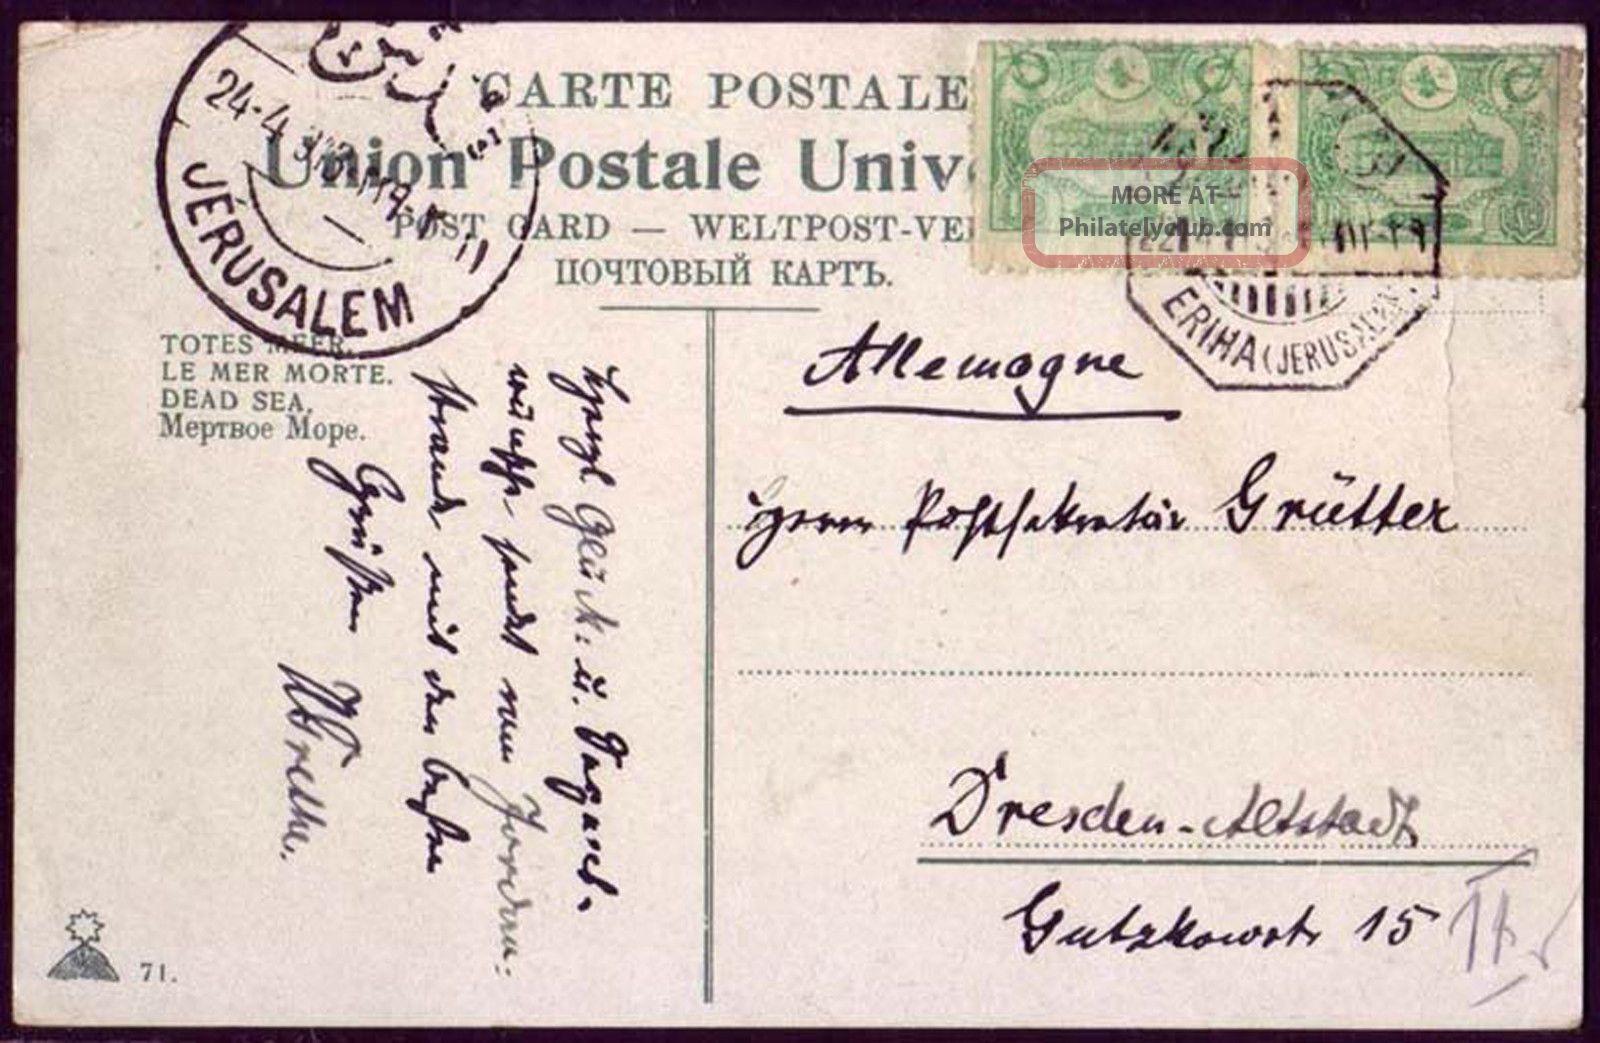 Ottoman Israel Palsetine 1913 Jericho Eriha Error Pc Via Jerusalem; Certificated Middle East photo